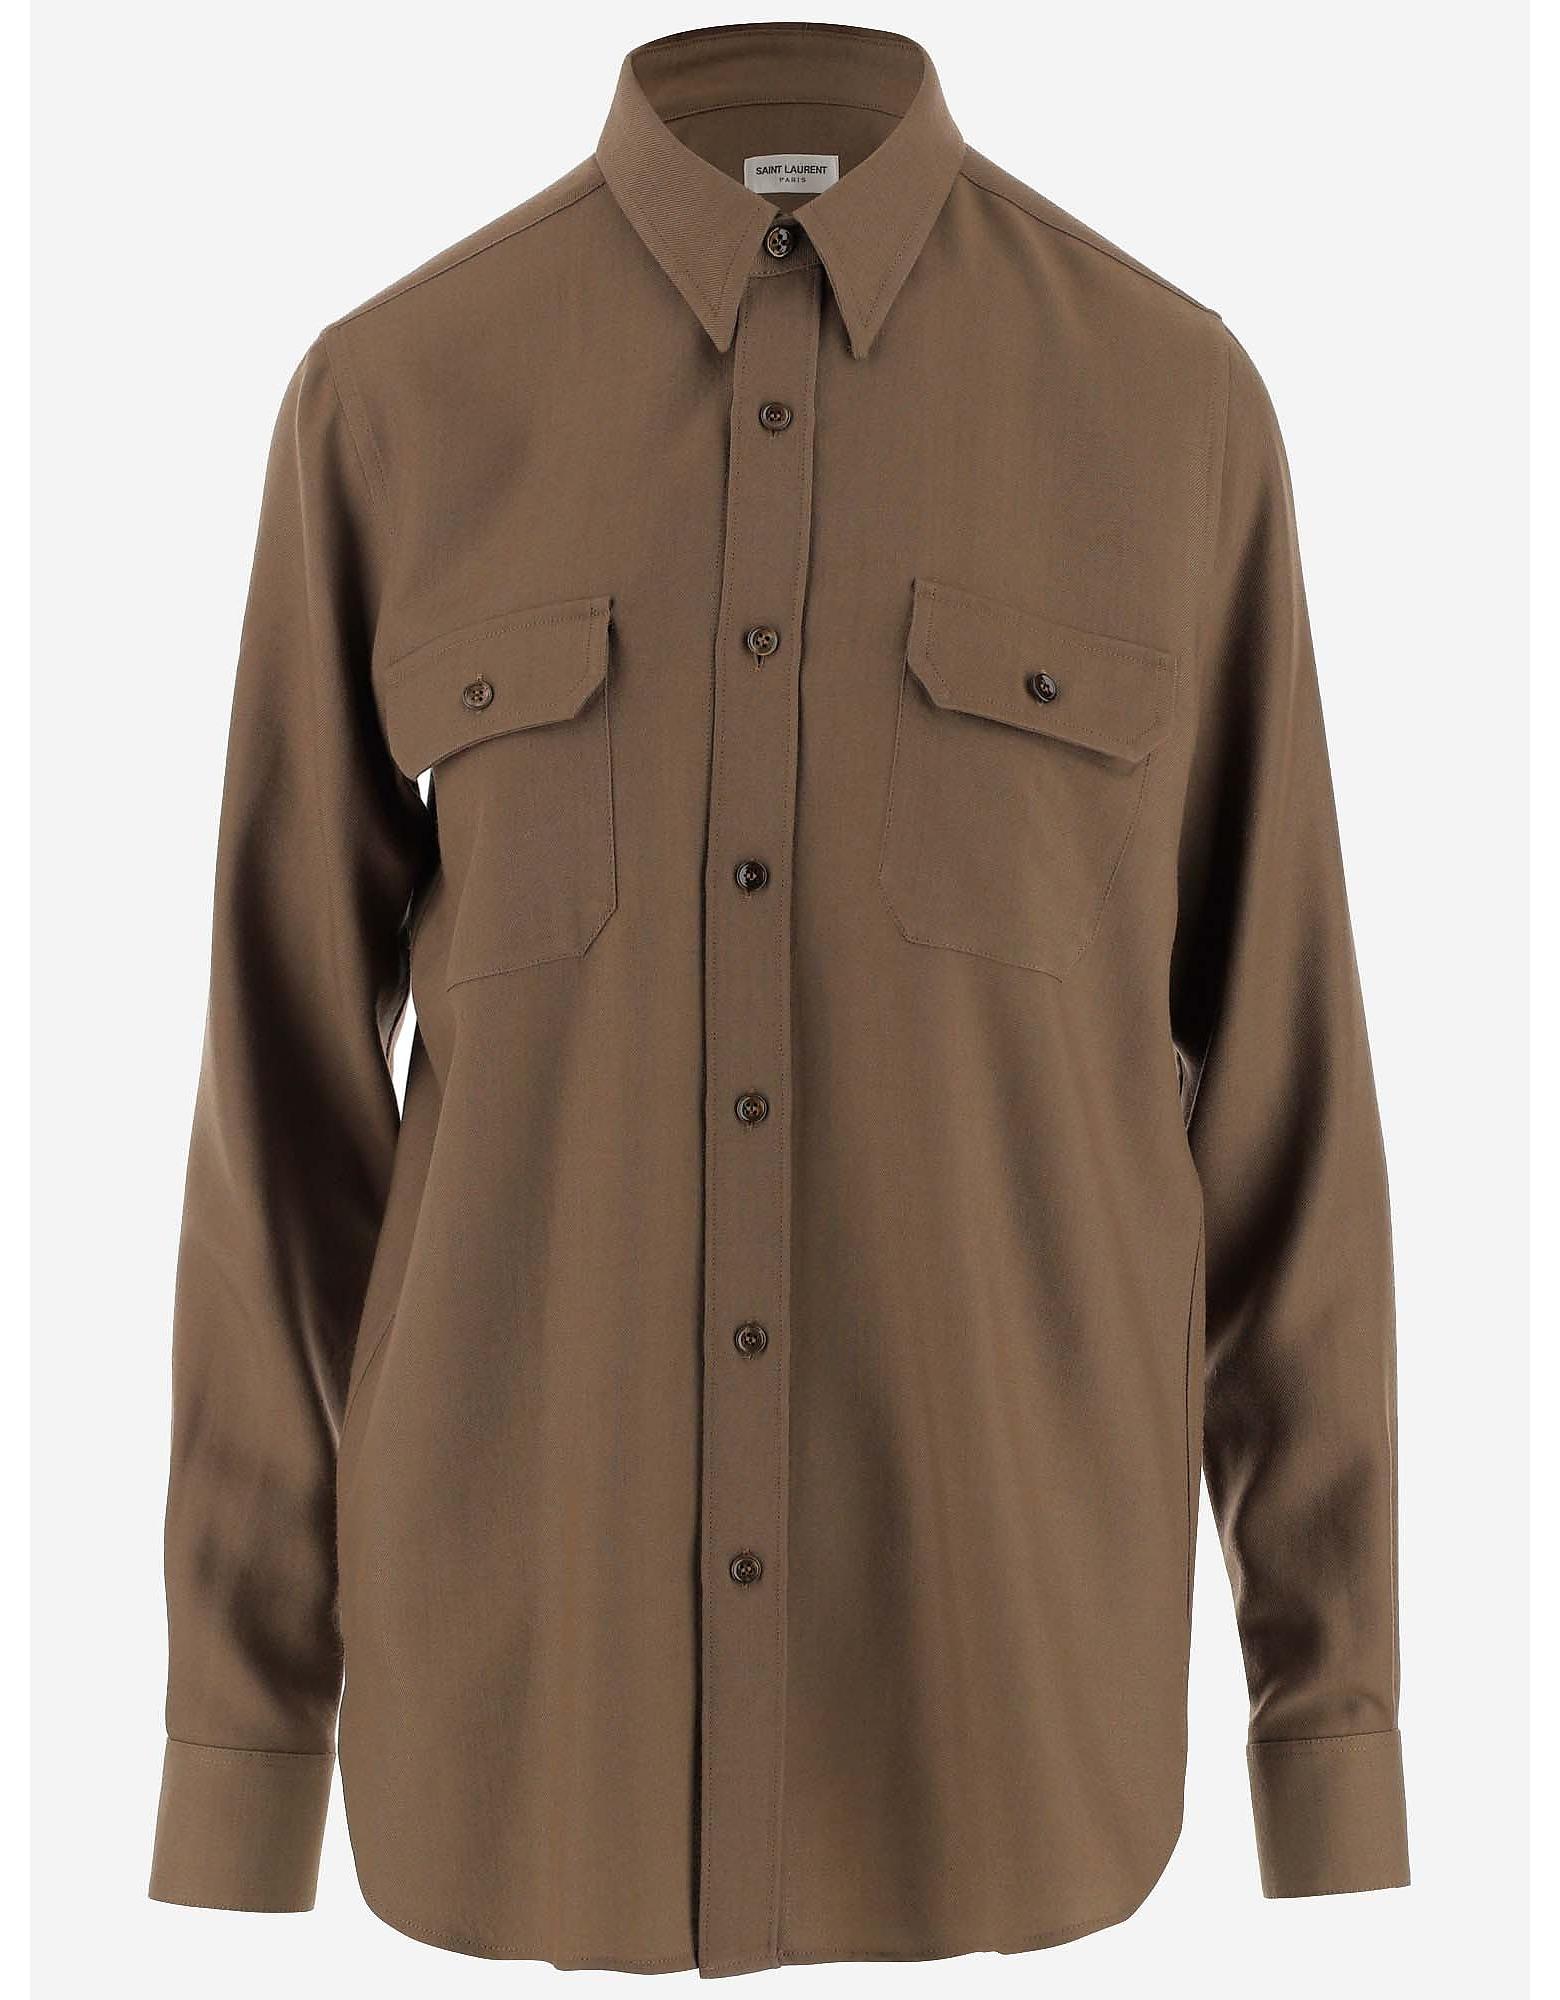 Saint Laurent Designer Shirts, Khaki Wool Women's Casual Shirt